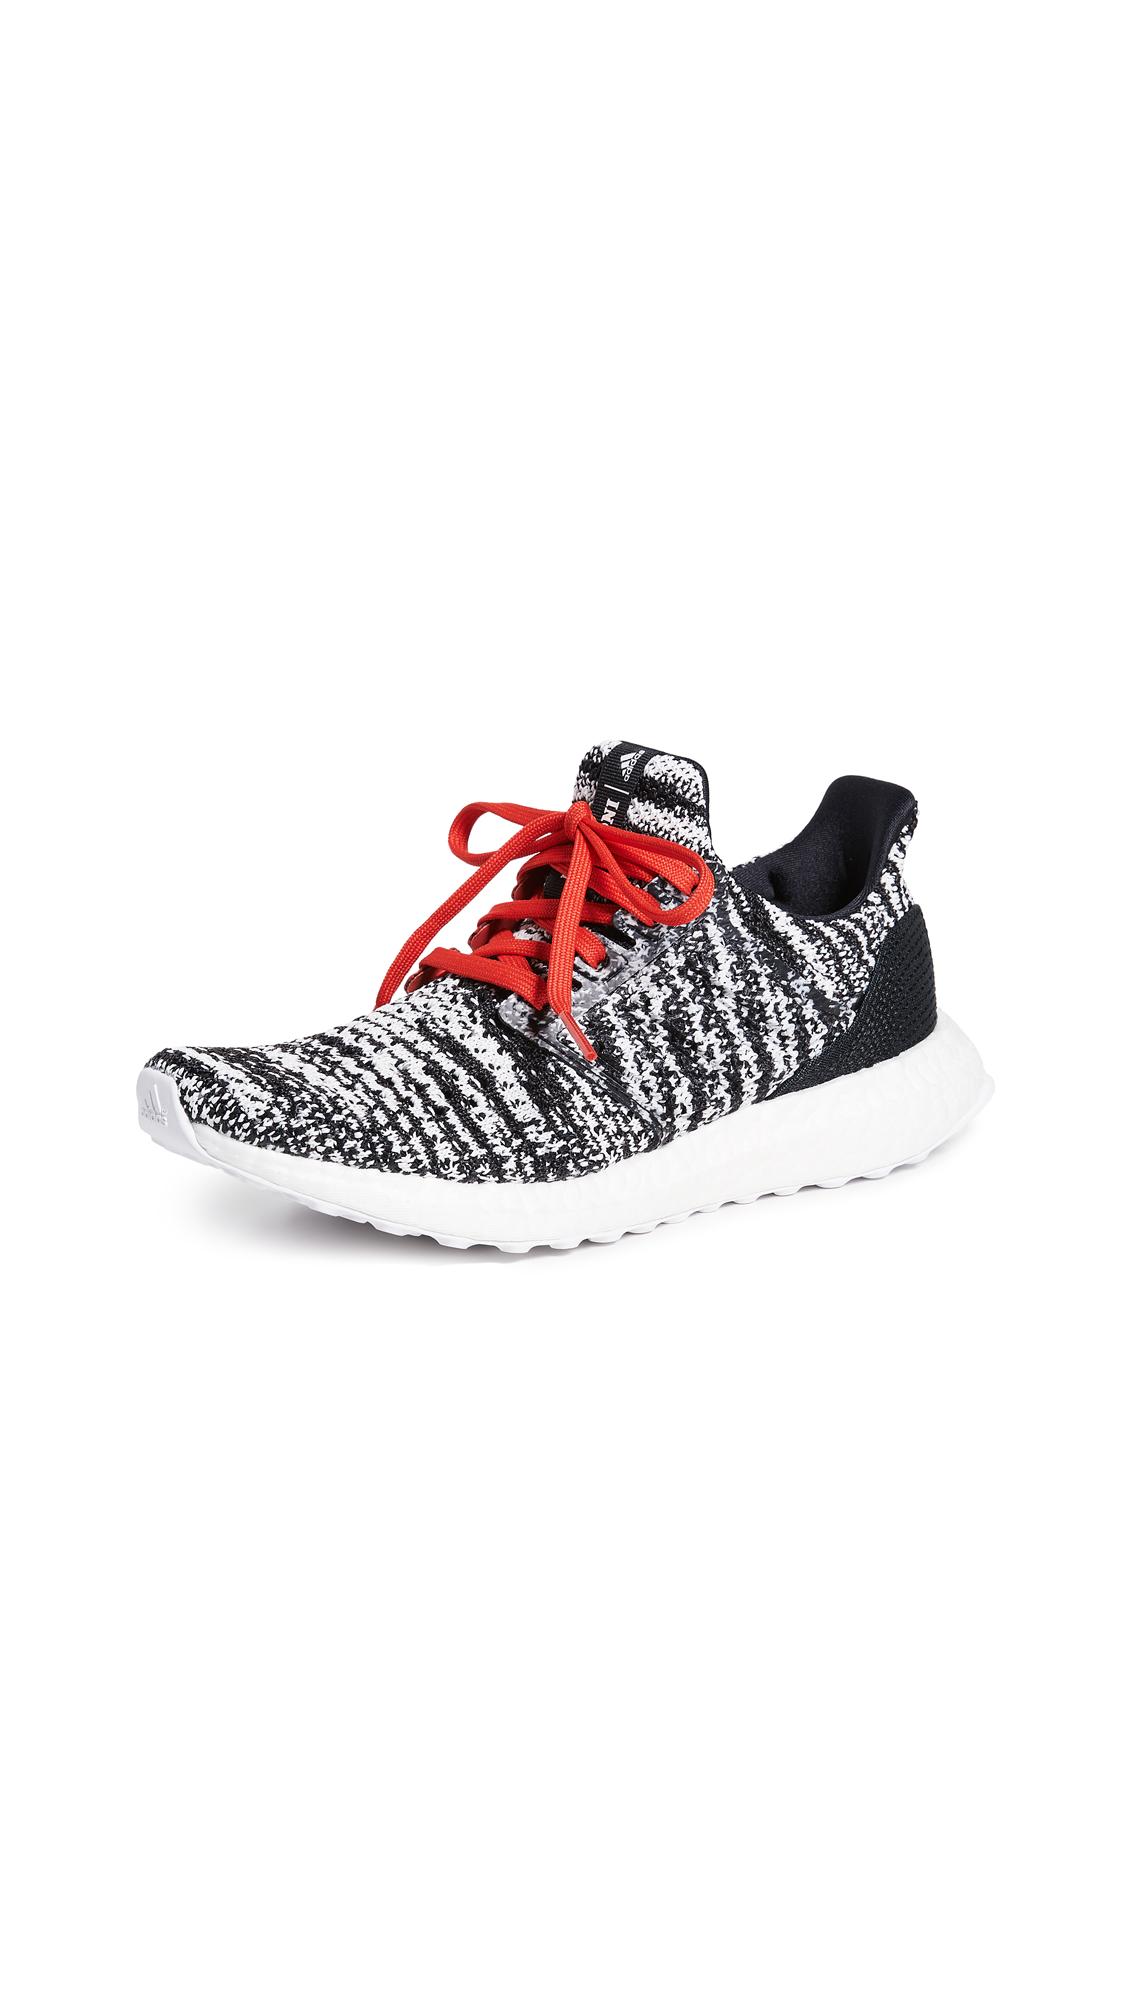 adidas Ultraboost CLIMA x MISSONI Sneakers - Core Black/White/Activere